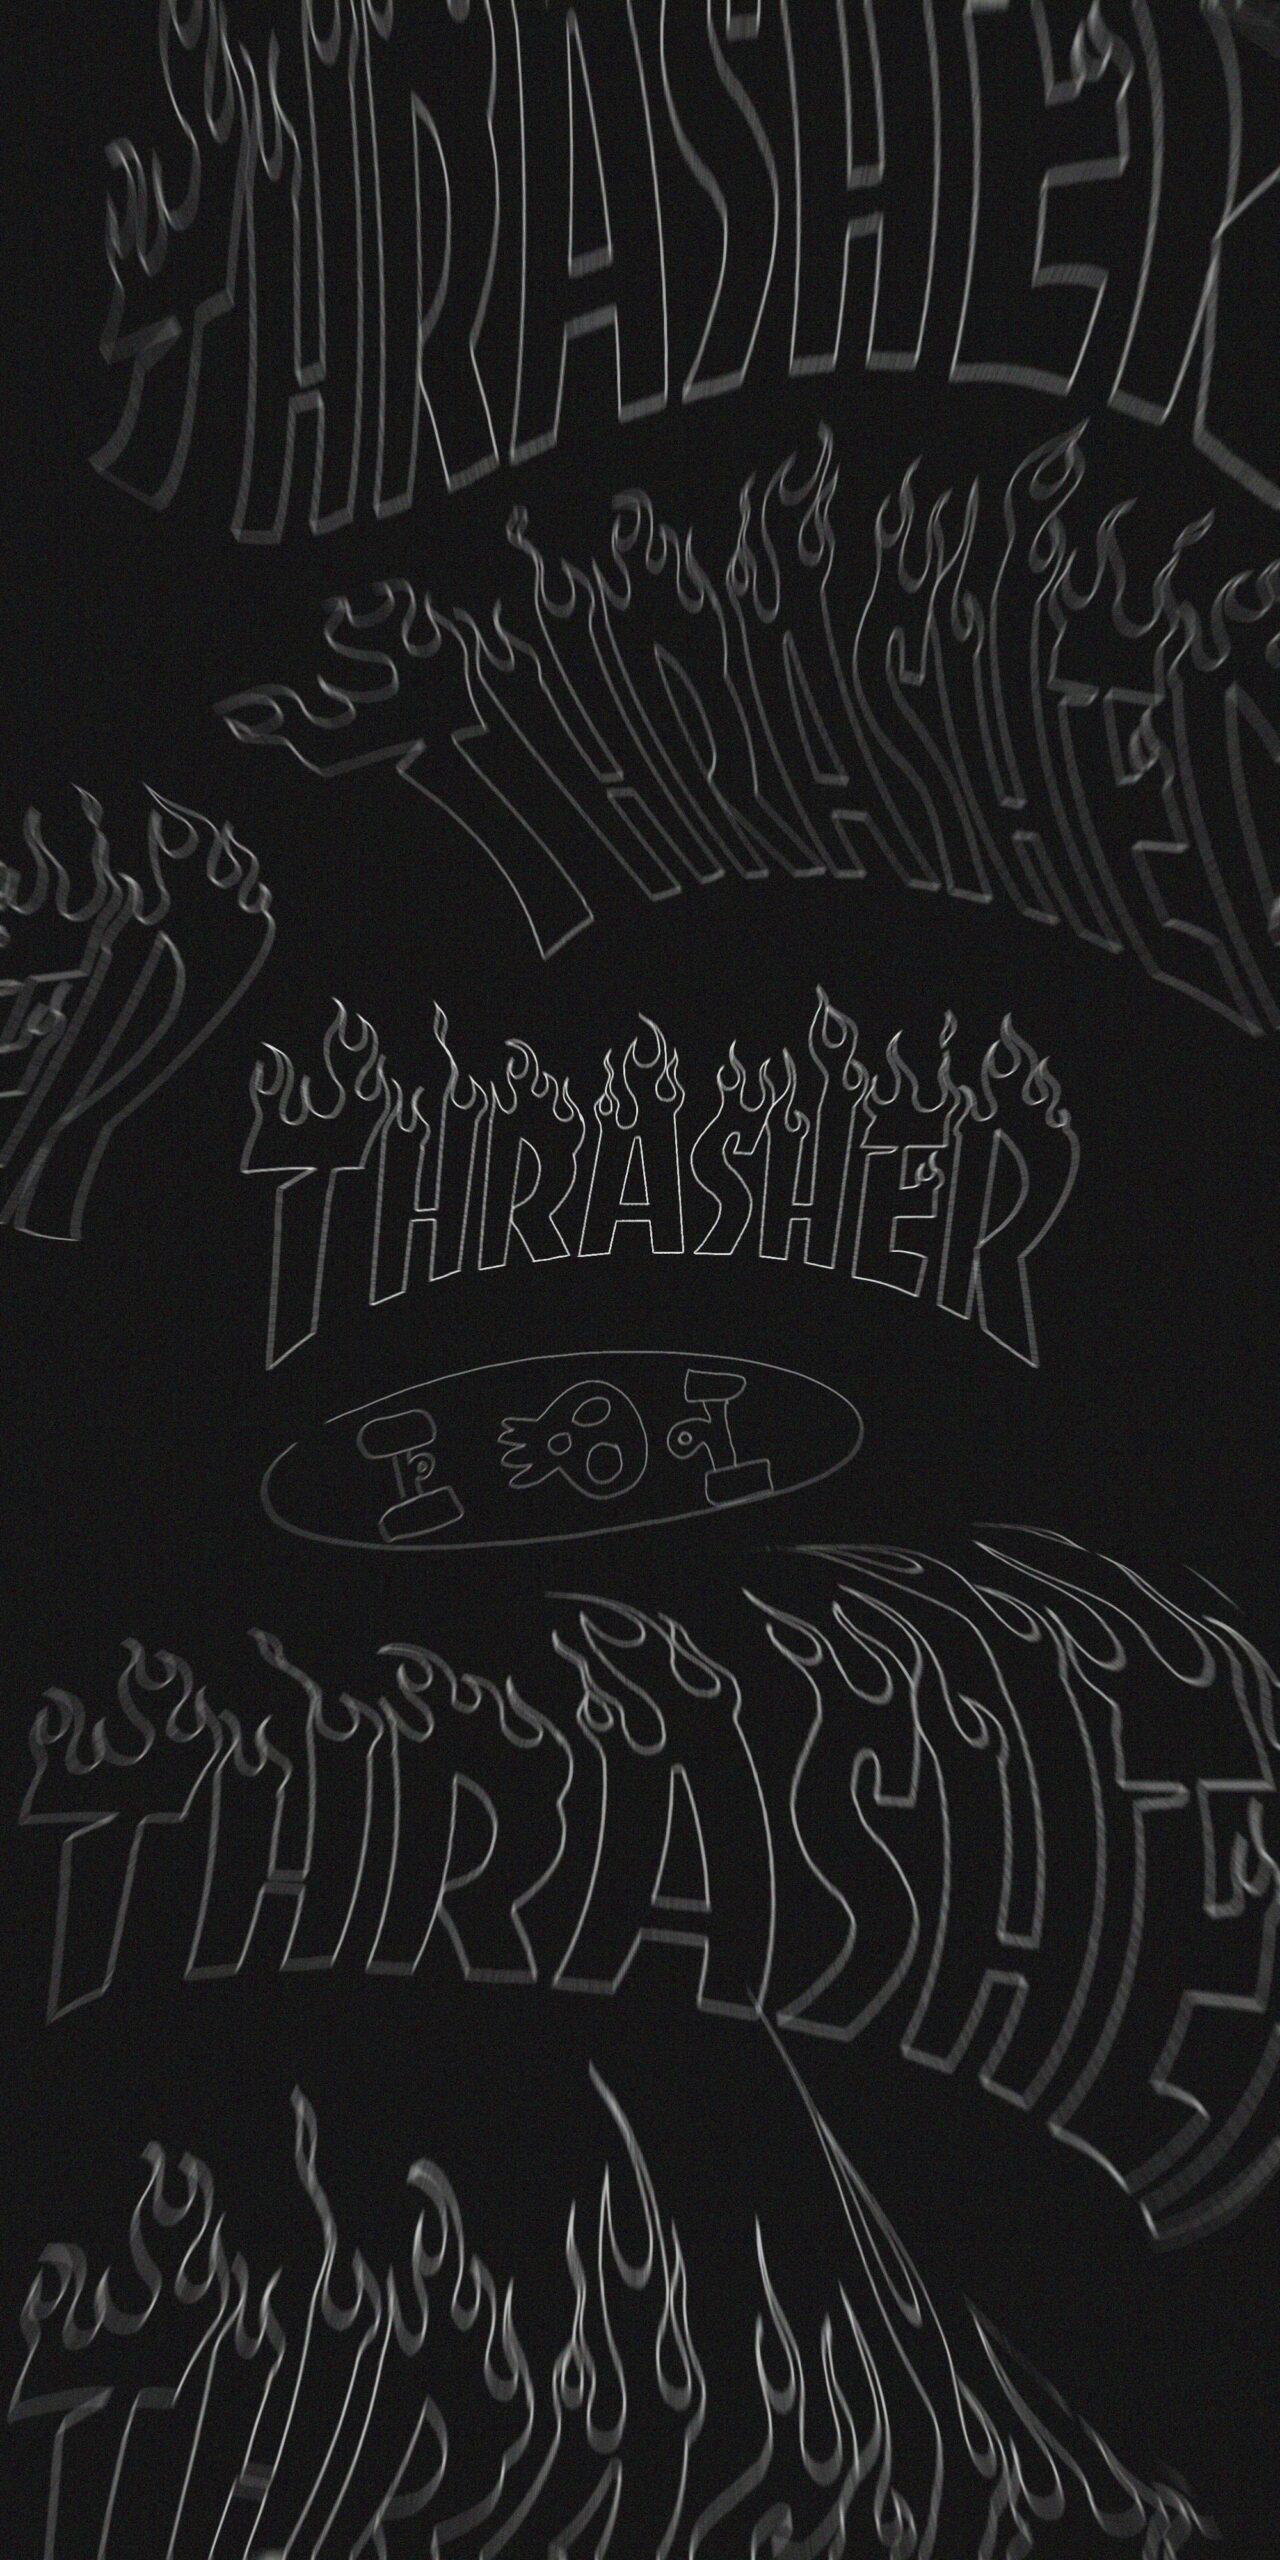 thrasher flame logo dark wavy background wallpaper